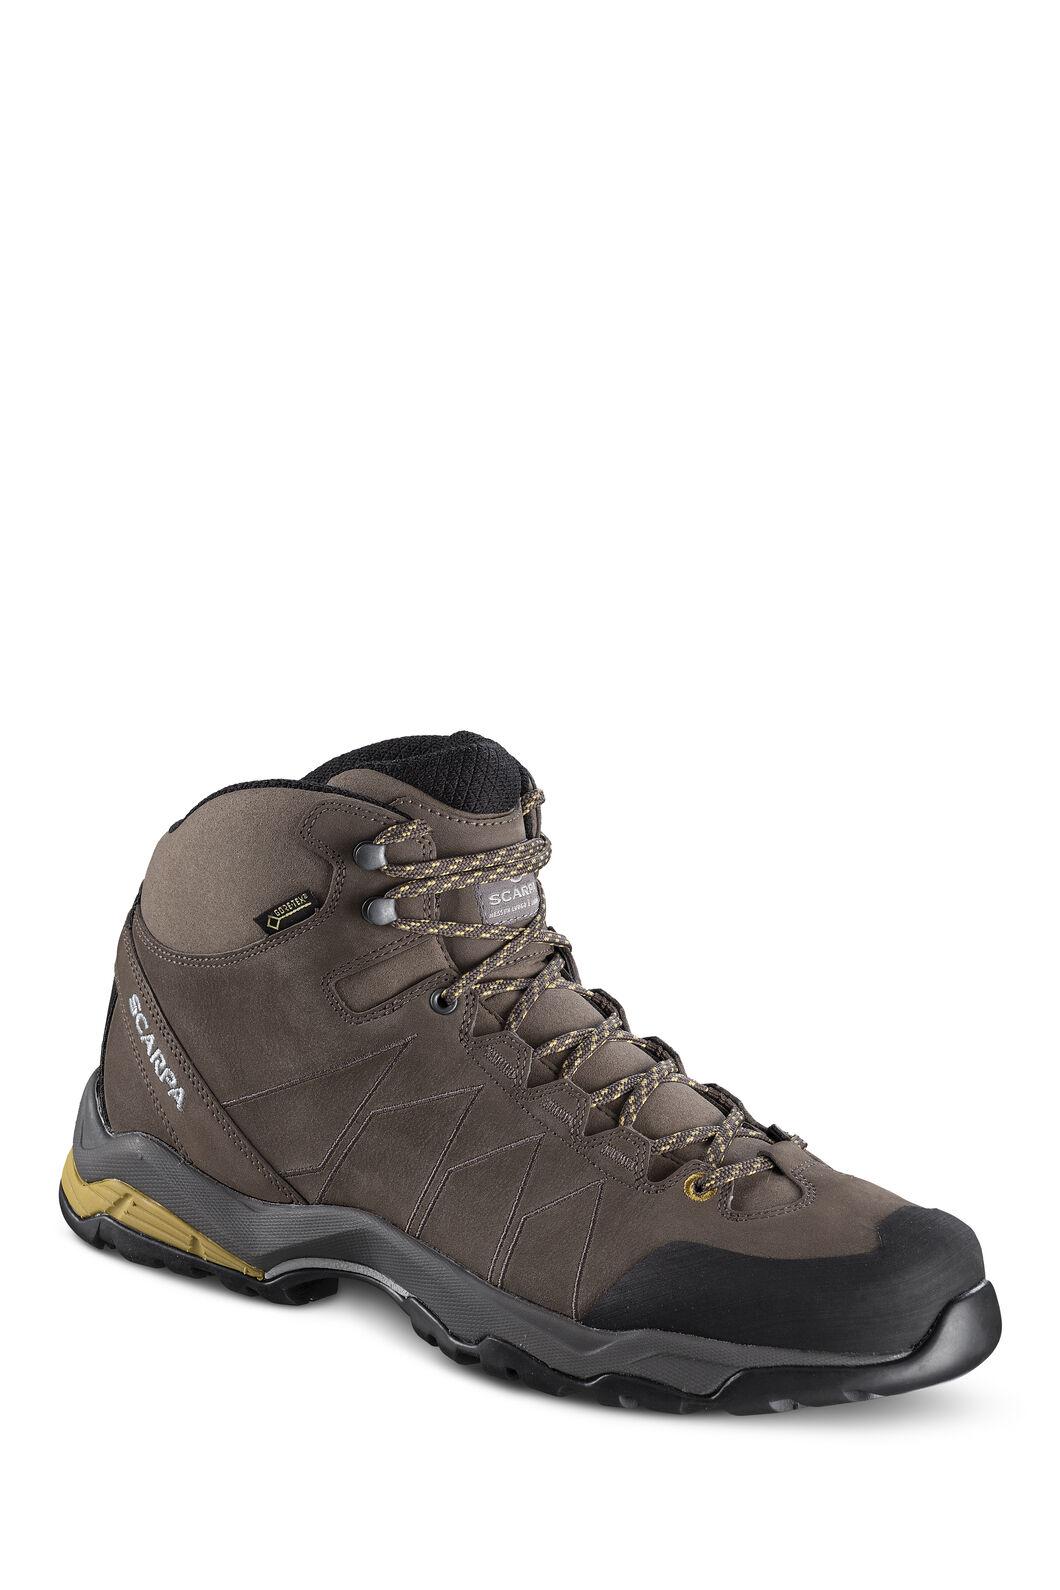 Scarpa Moraine Plus GTX Hiking Boot - Men's, Charcoal/SulphurGreen, hi-res